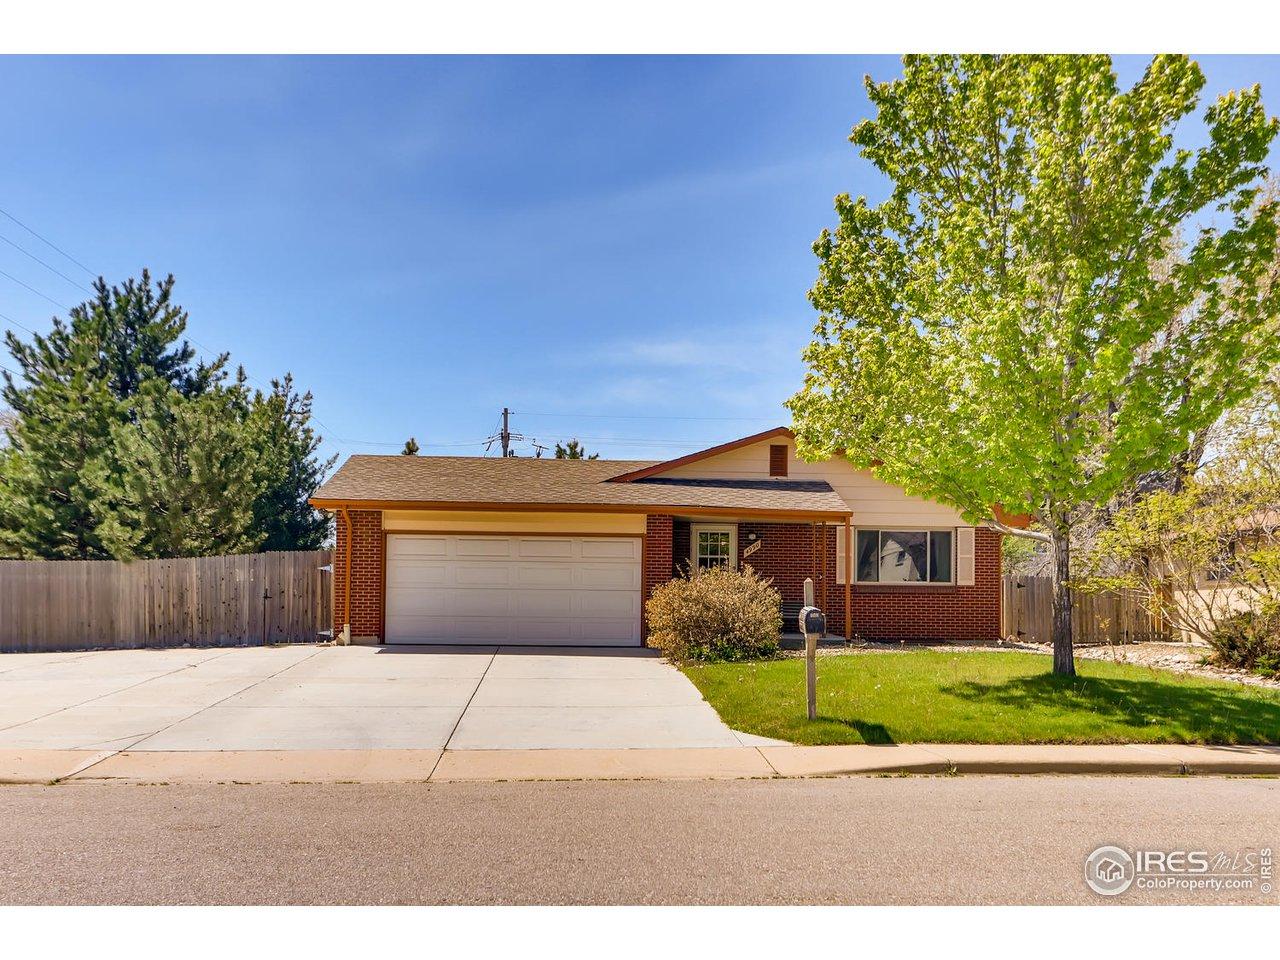 4990 Qualla Dr, Boulder CO 80303